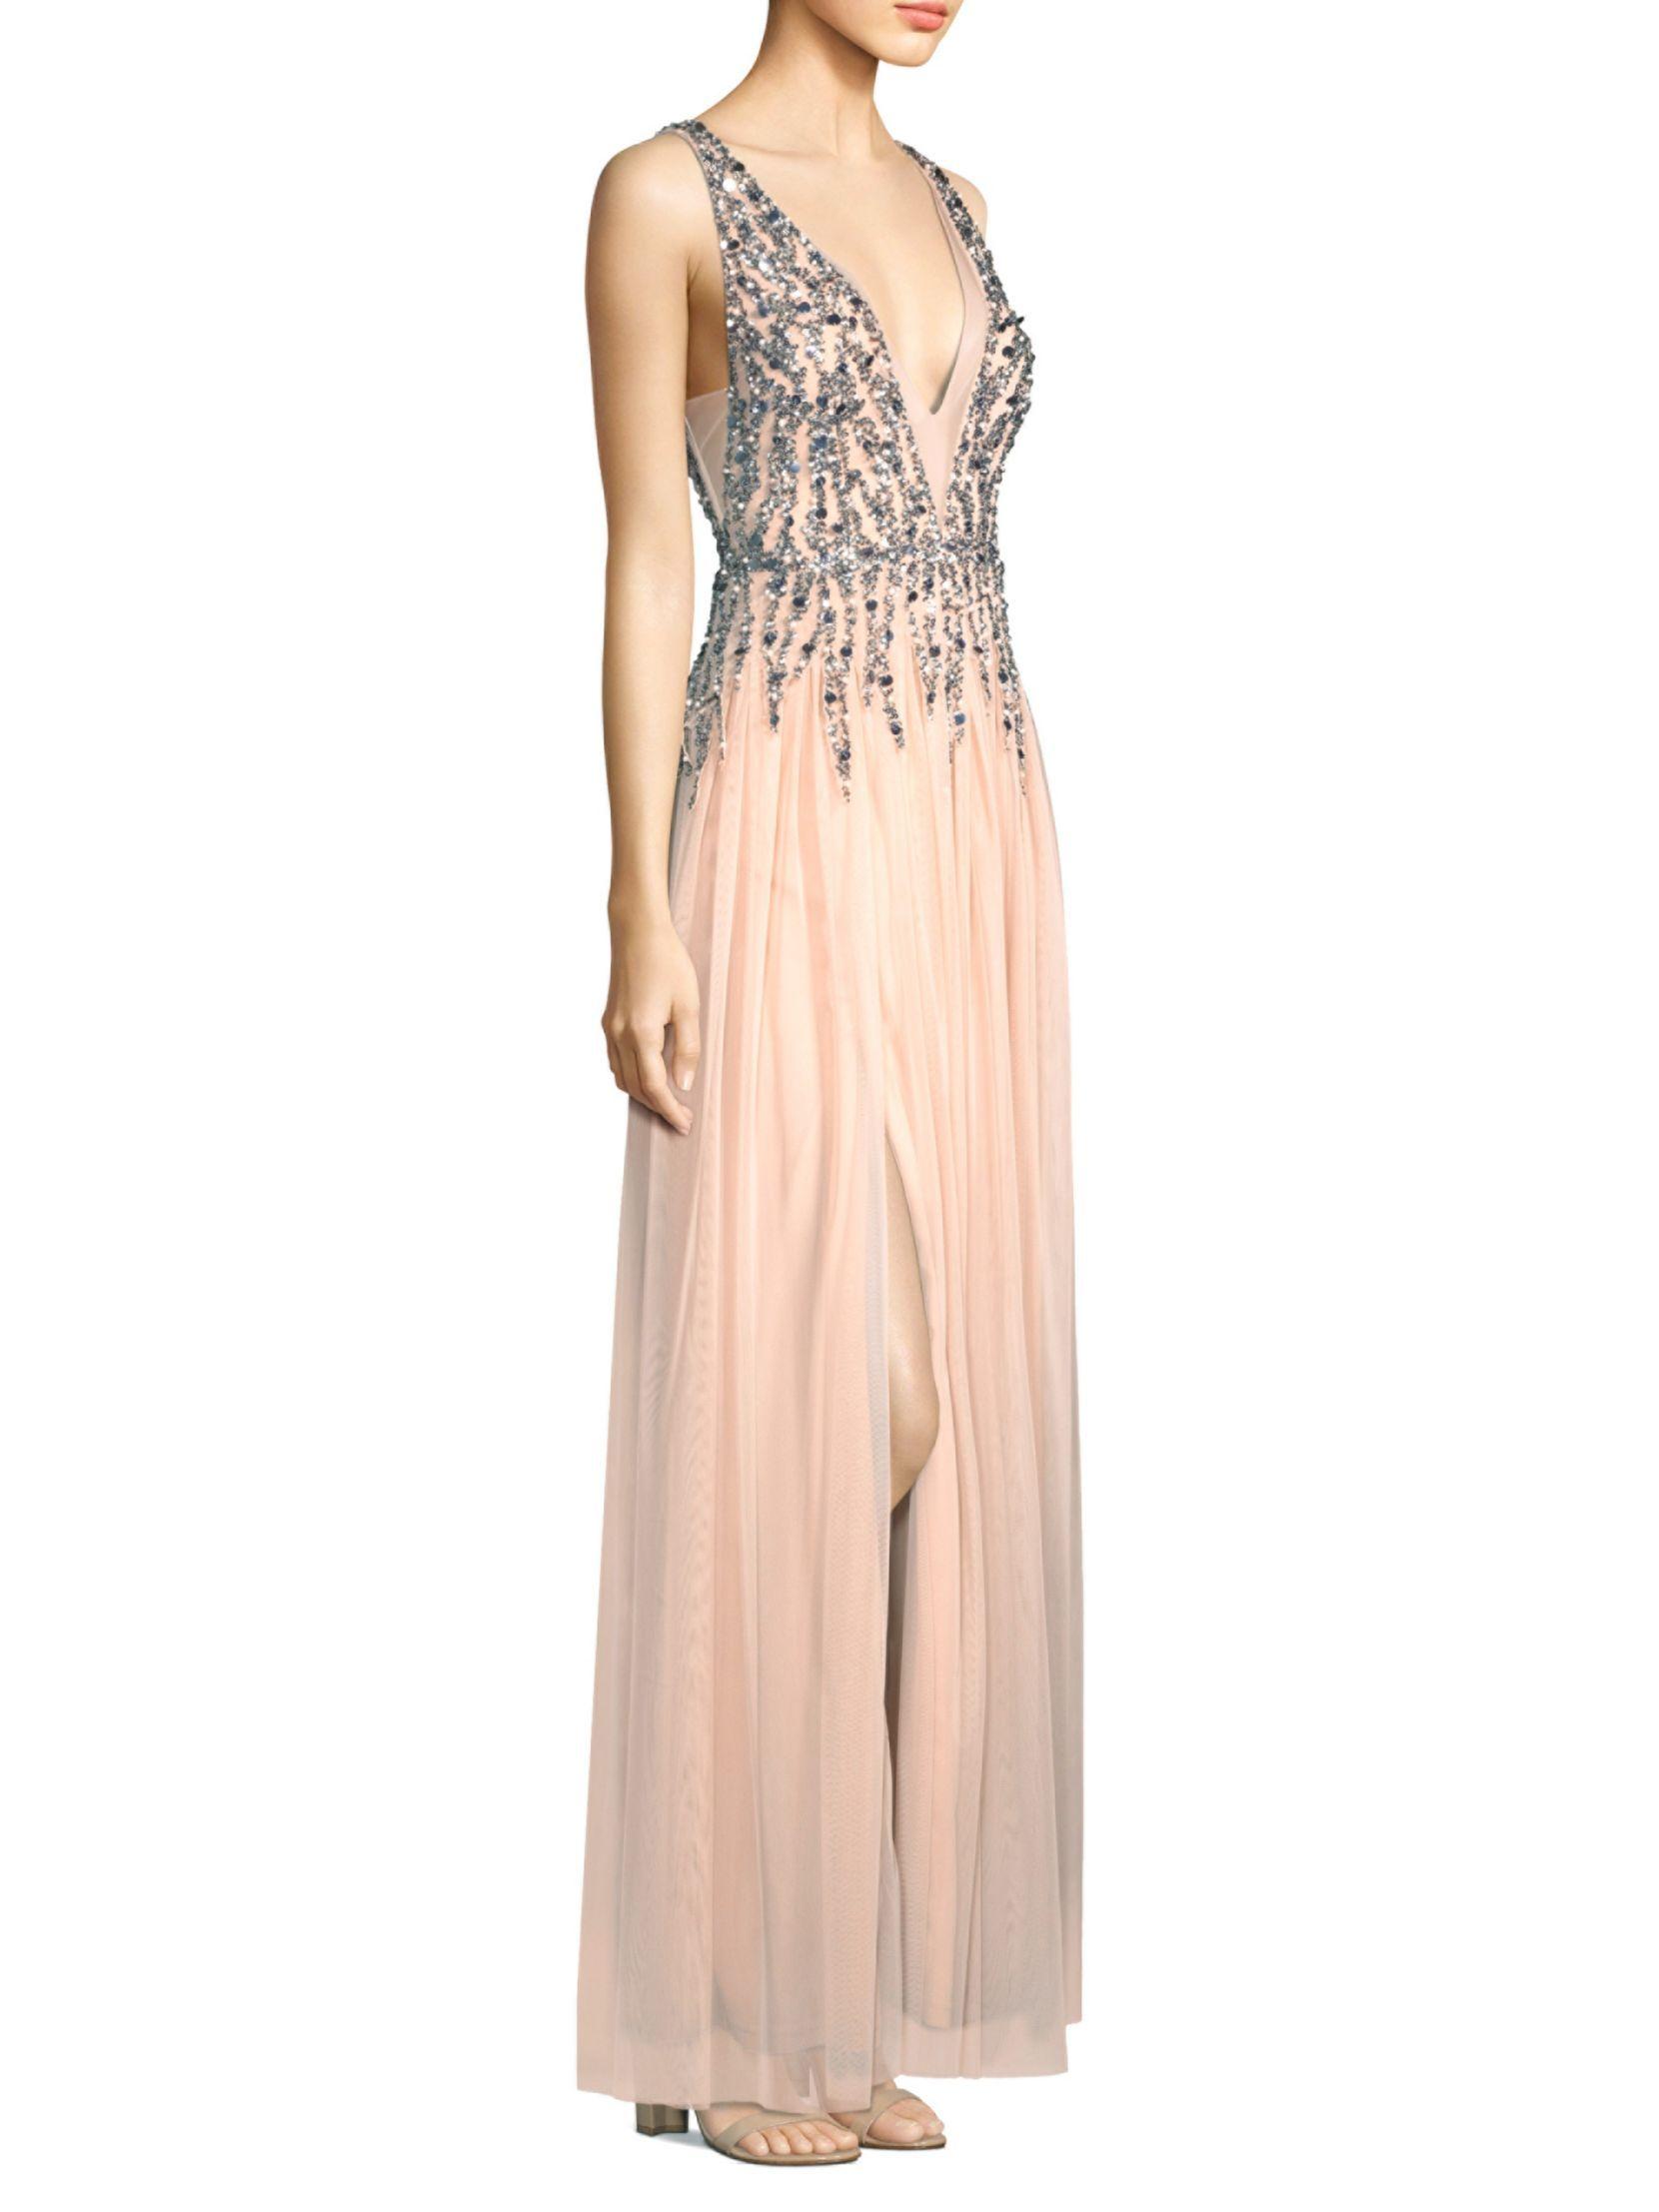 Aidan Mattox Sleeveless Beaded Dress – Dresses for Woman